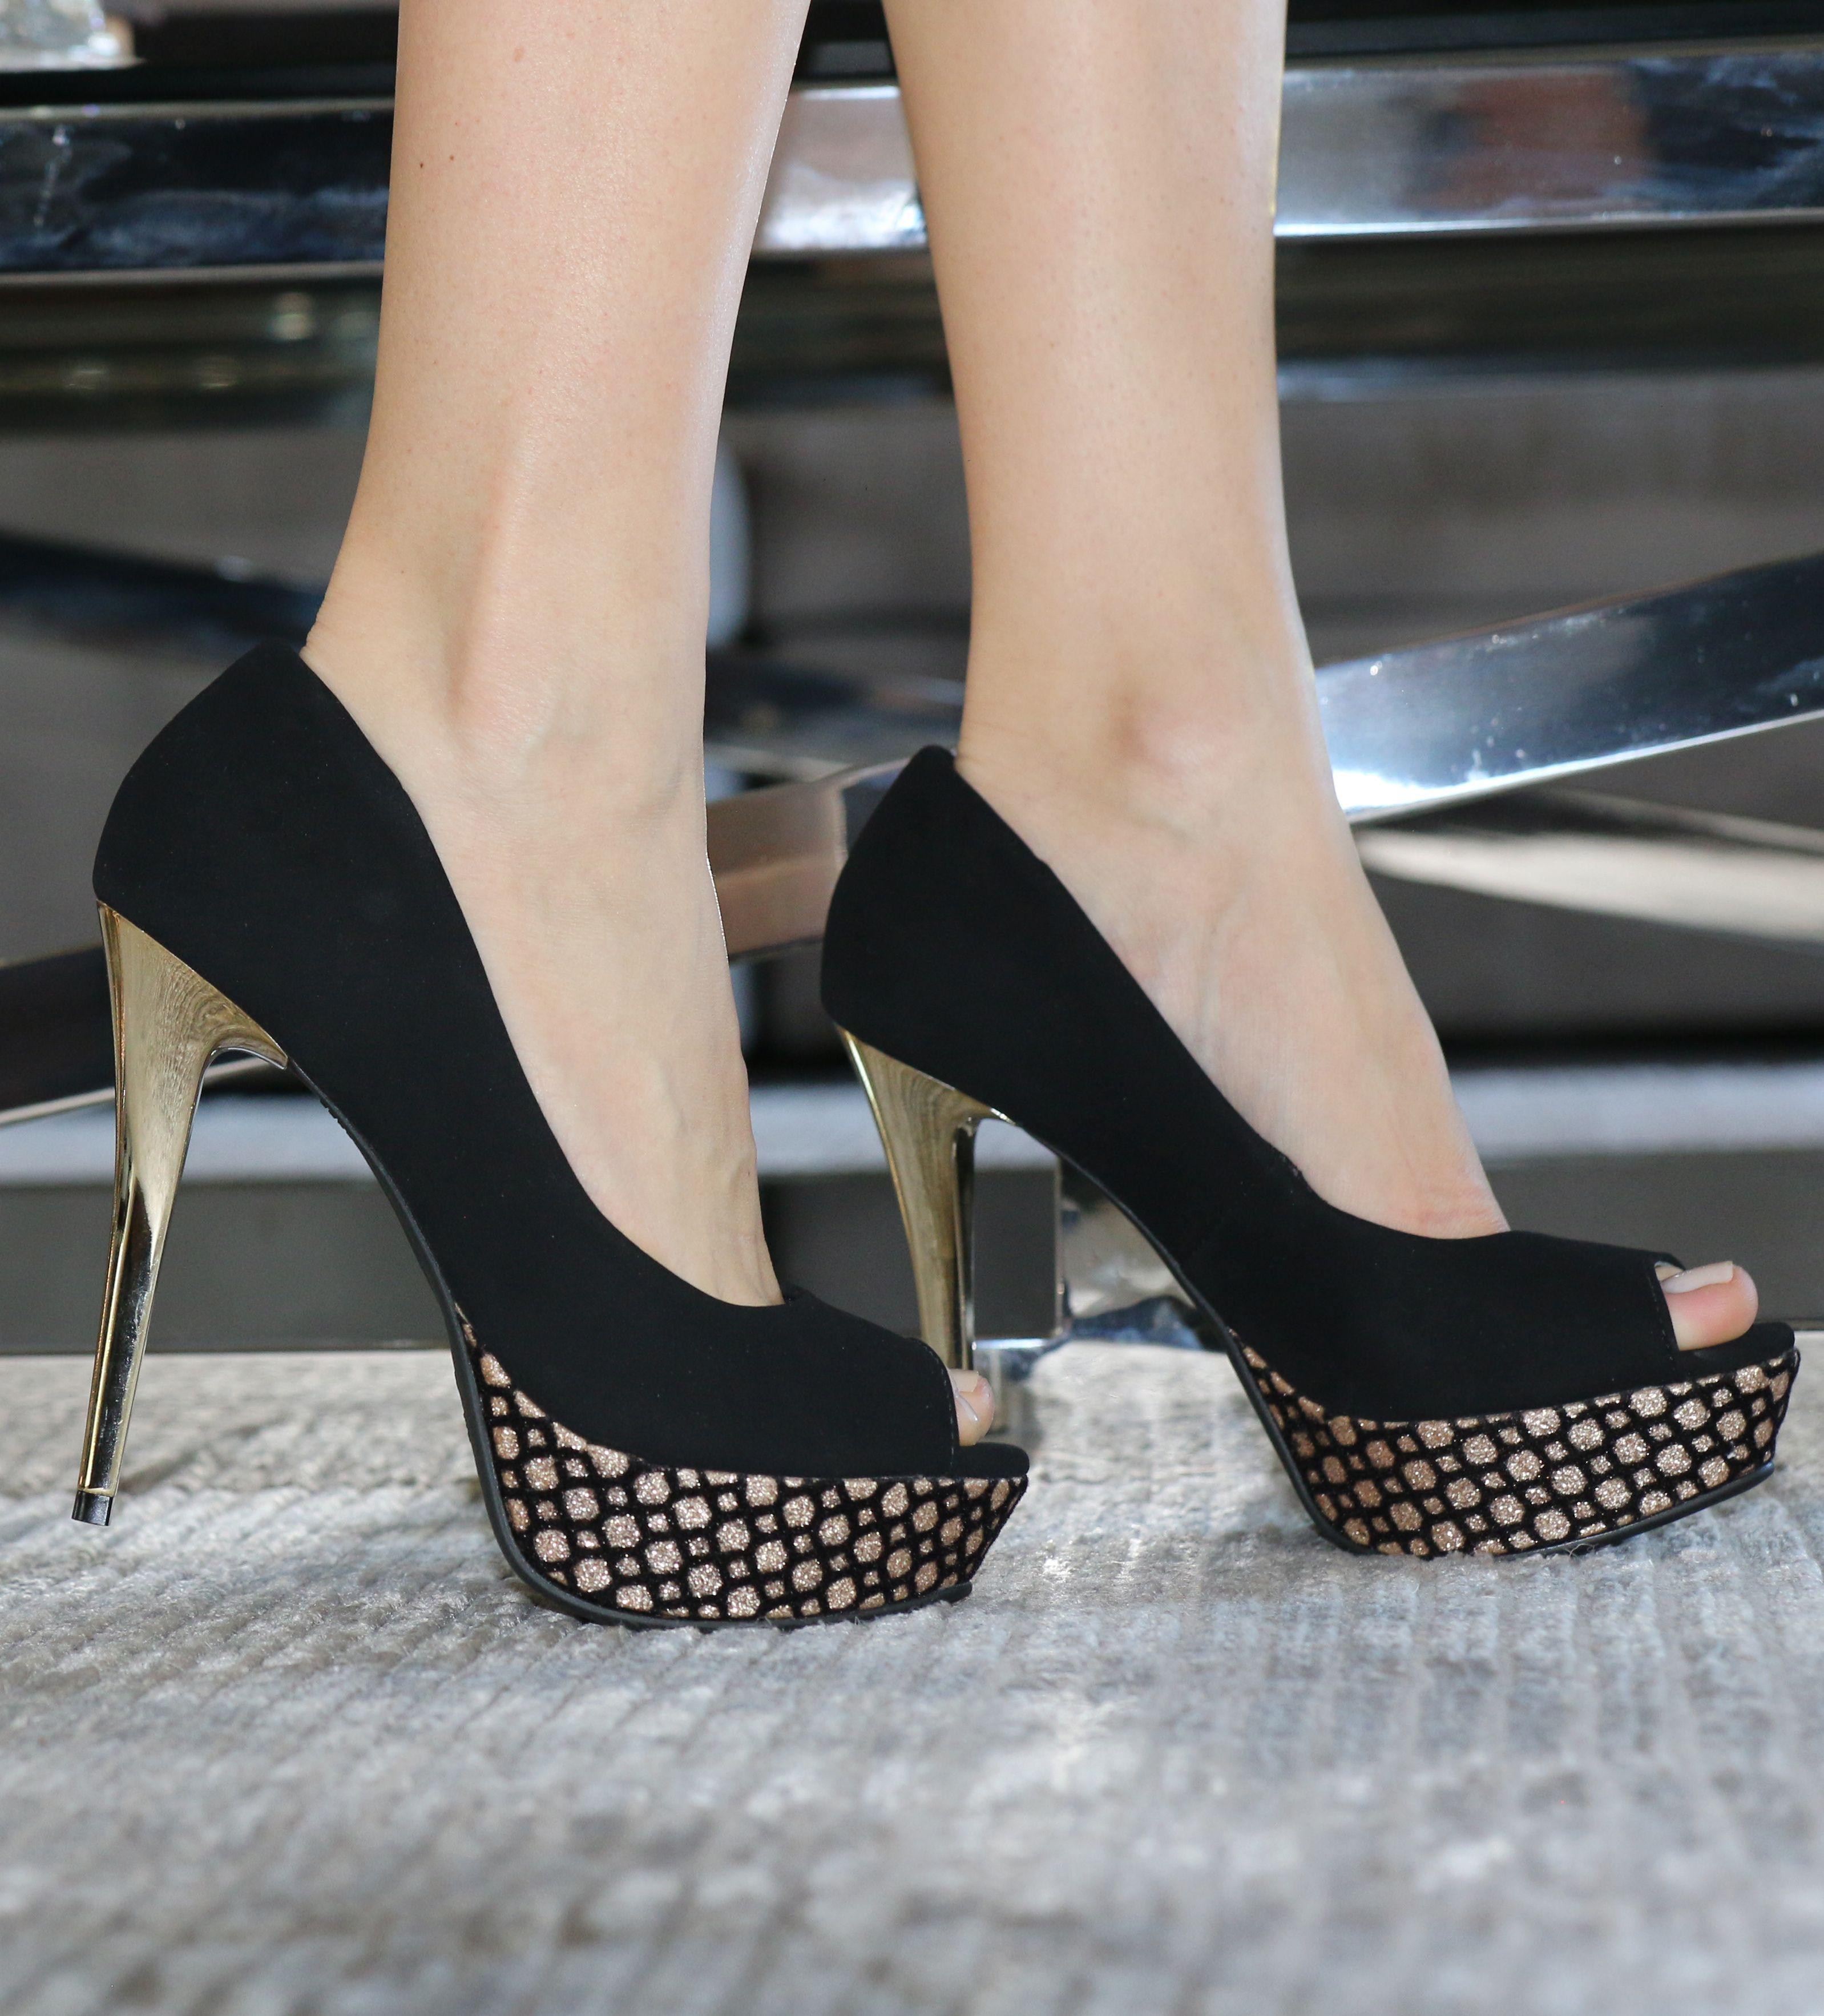 626491607 peep toe preto - salto alto - high heels - dourado - party shoes - Inverno  2015 - Ref. 15-3001